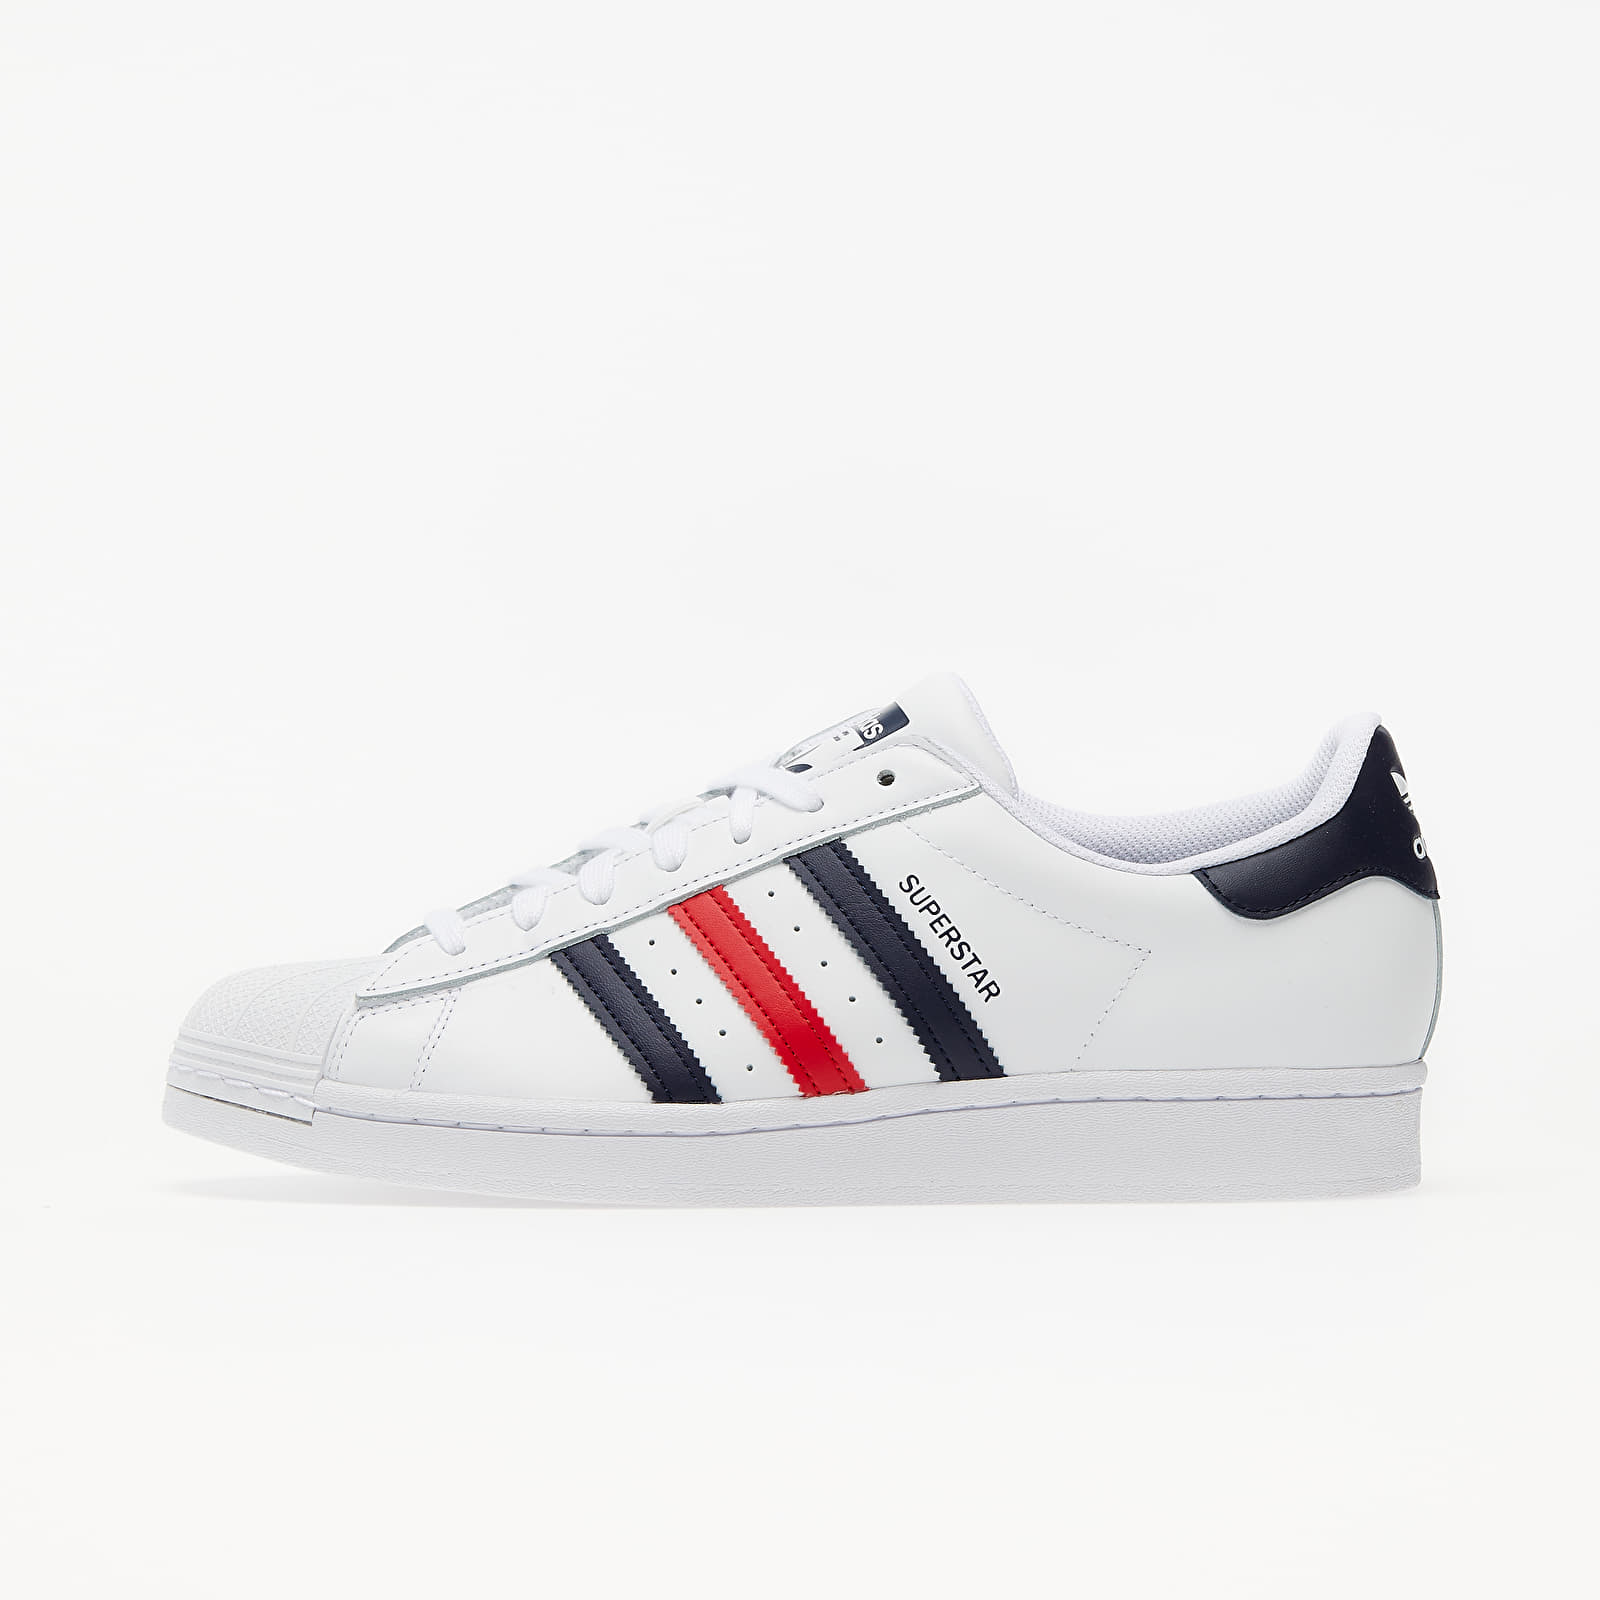 Pánské tenisky a boty adidas Superstar Ftw White/ Scarlet/ Ftw White